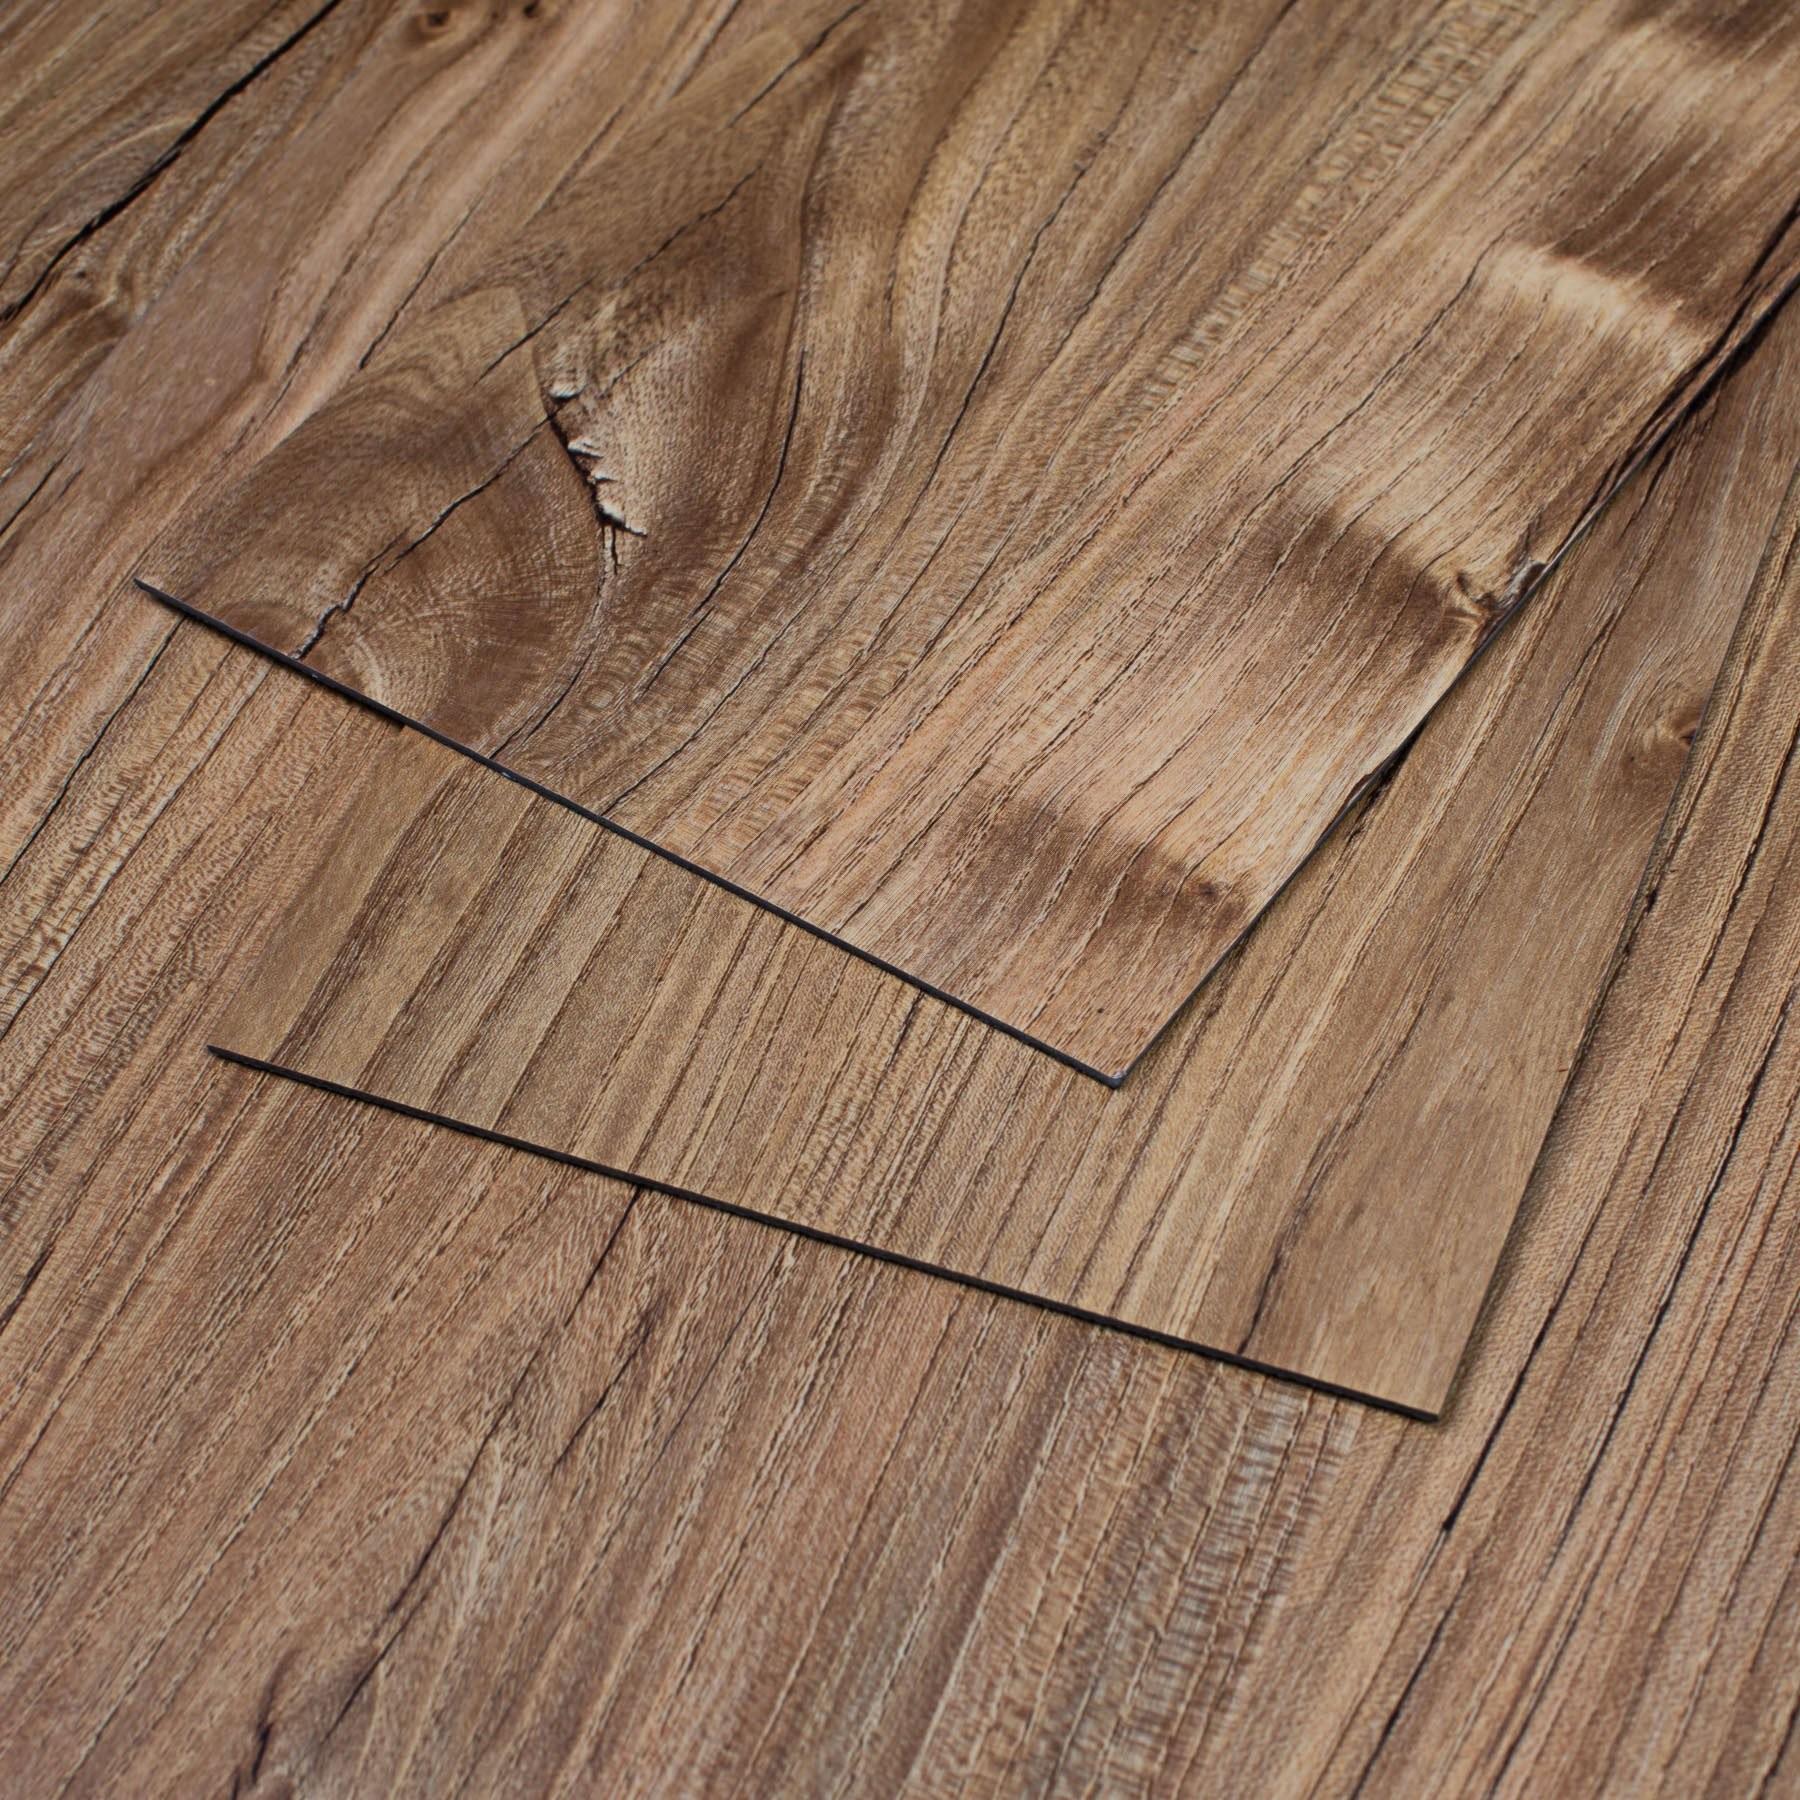 47 Sq Ft Red Pine Vinyl Plank Flooring